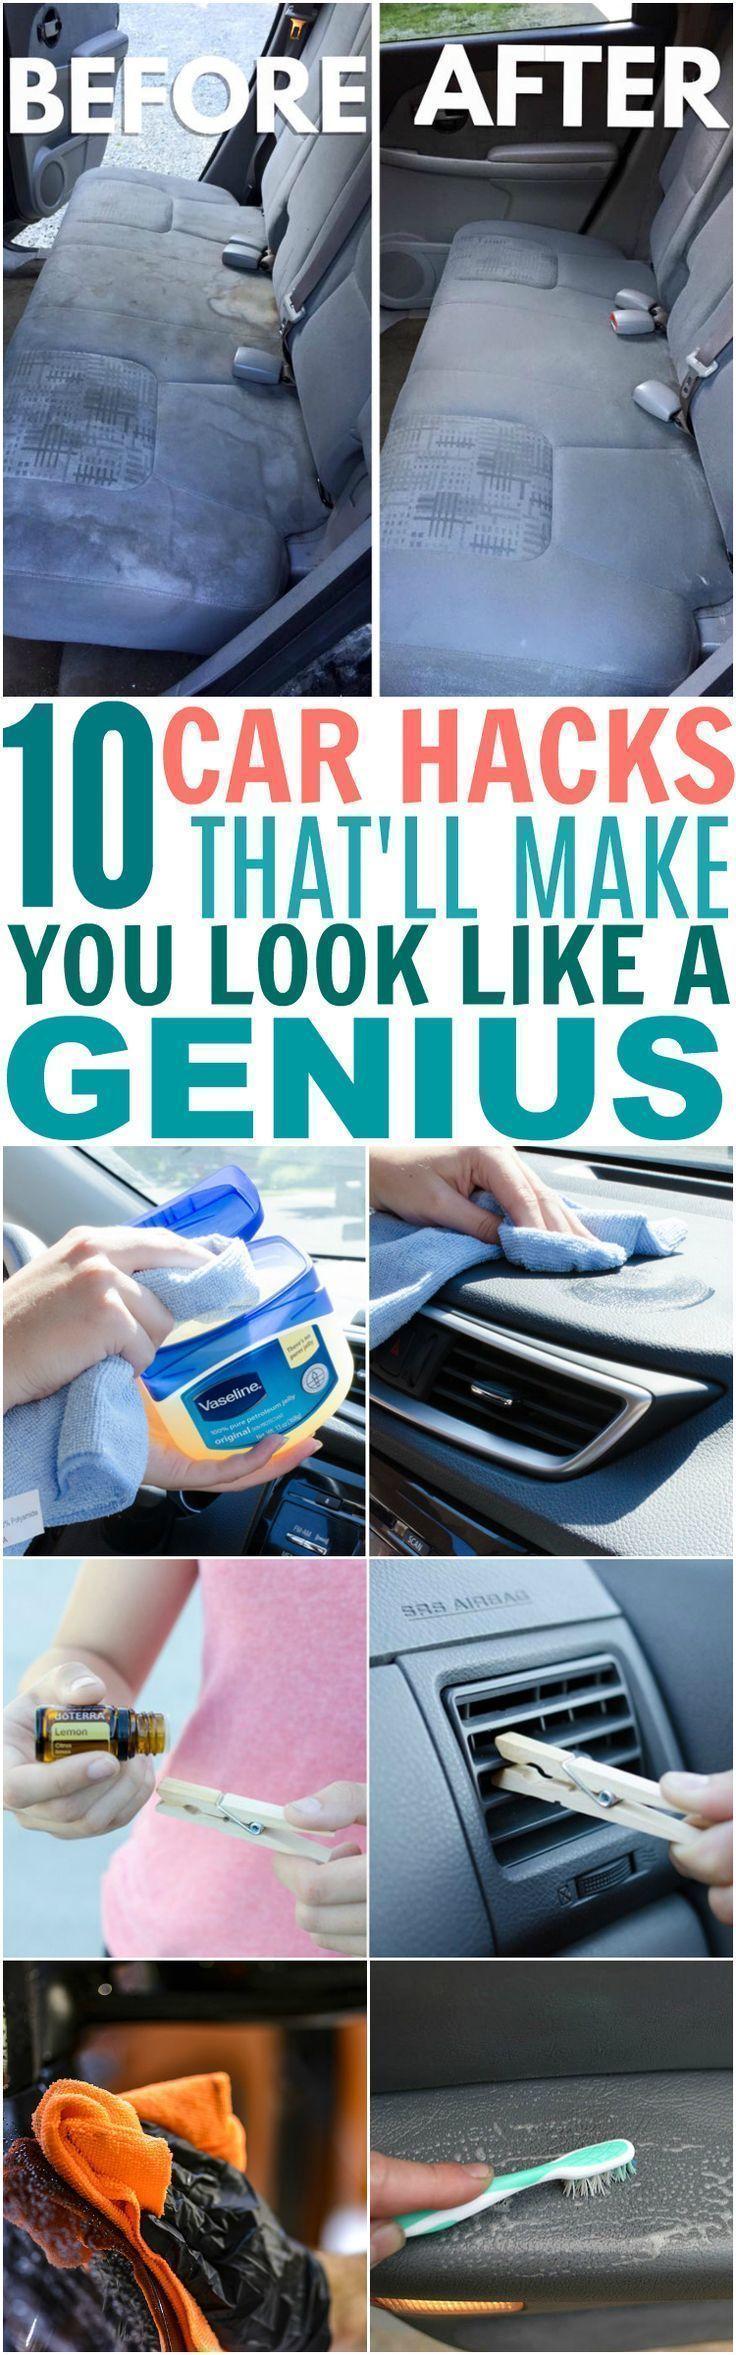 12 diy car detailing tips and tricks thatll make it like